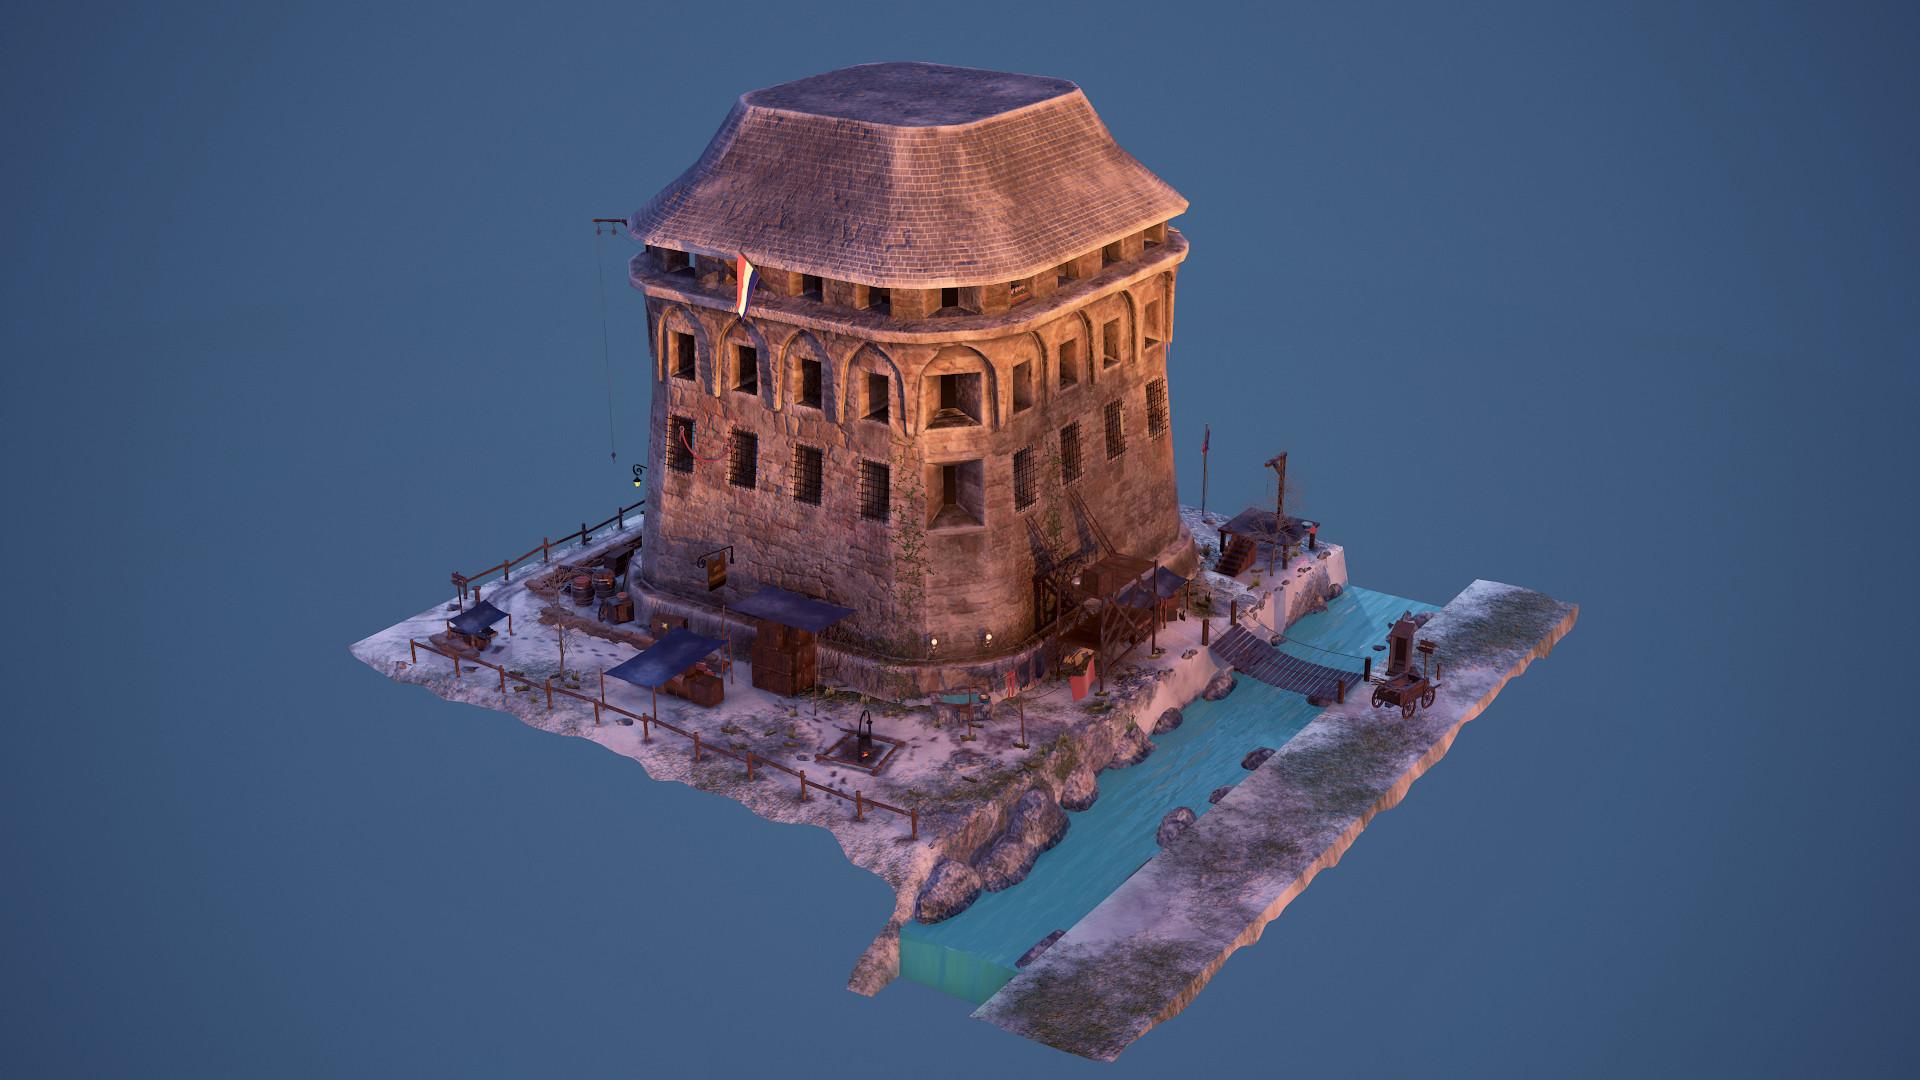 Dani palacio santolaria screenshot024